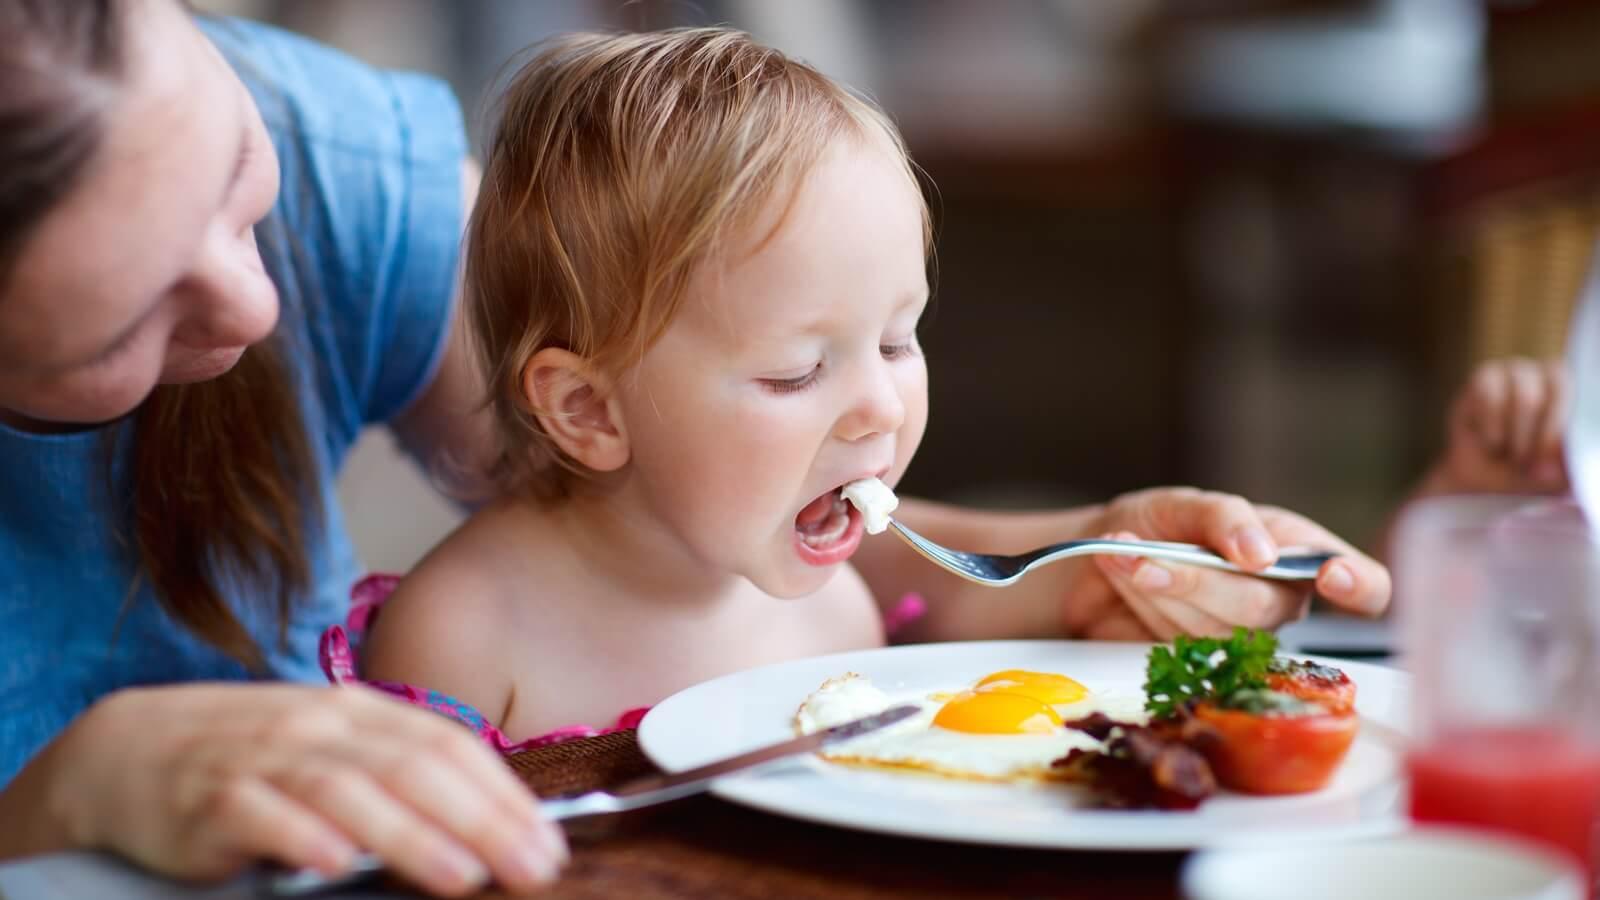 No sobornes a tus hijos para que coman verduras